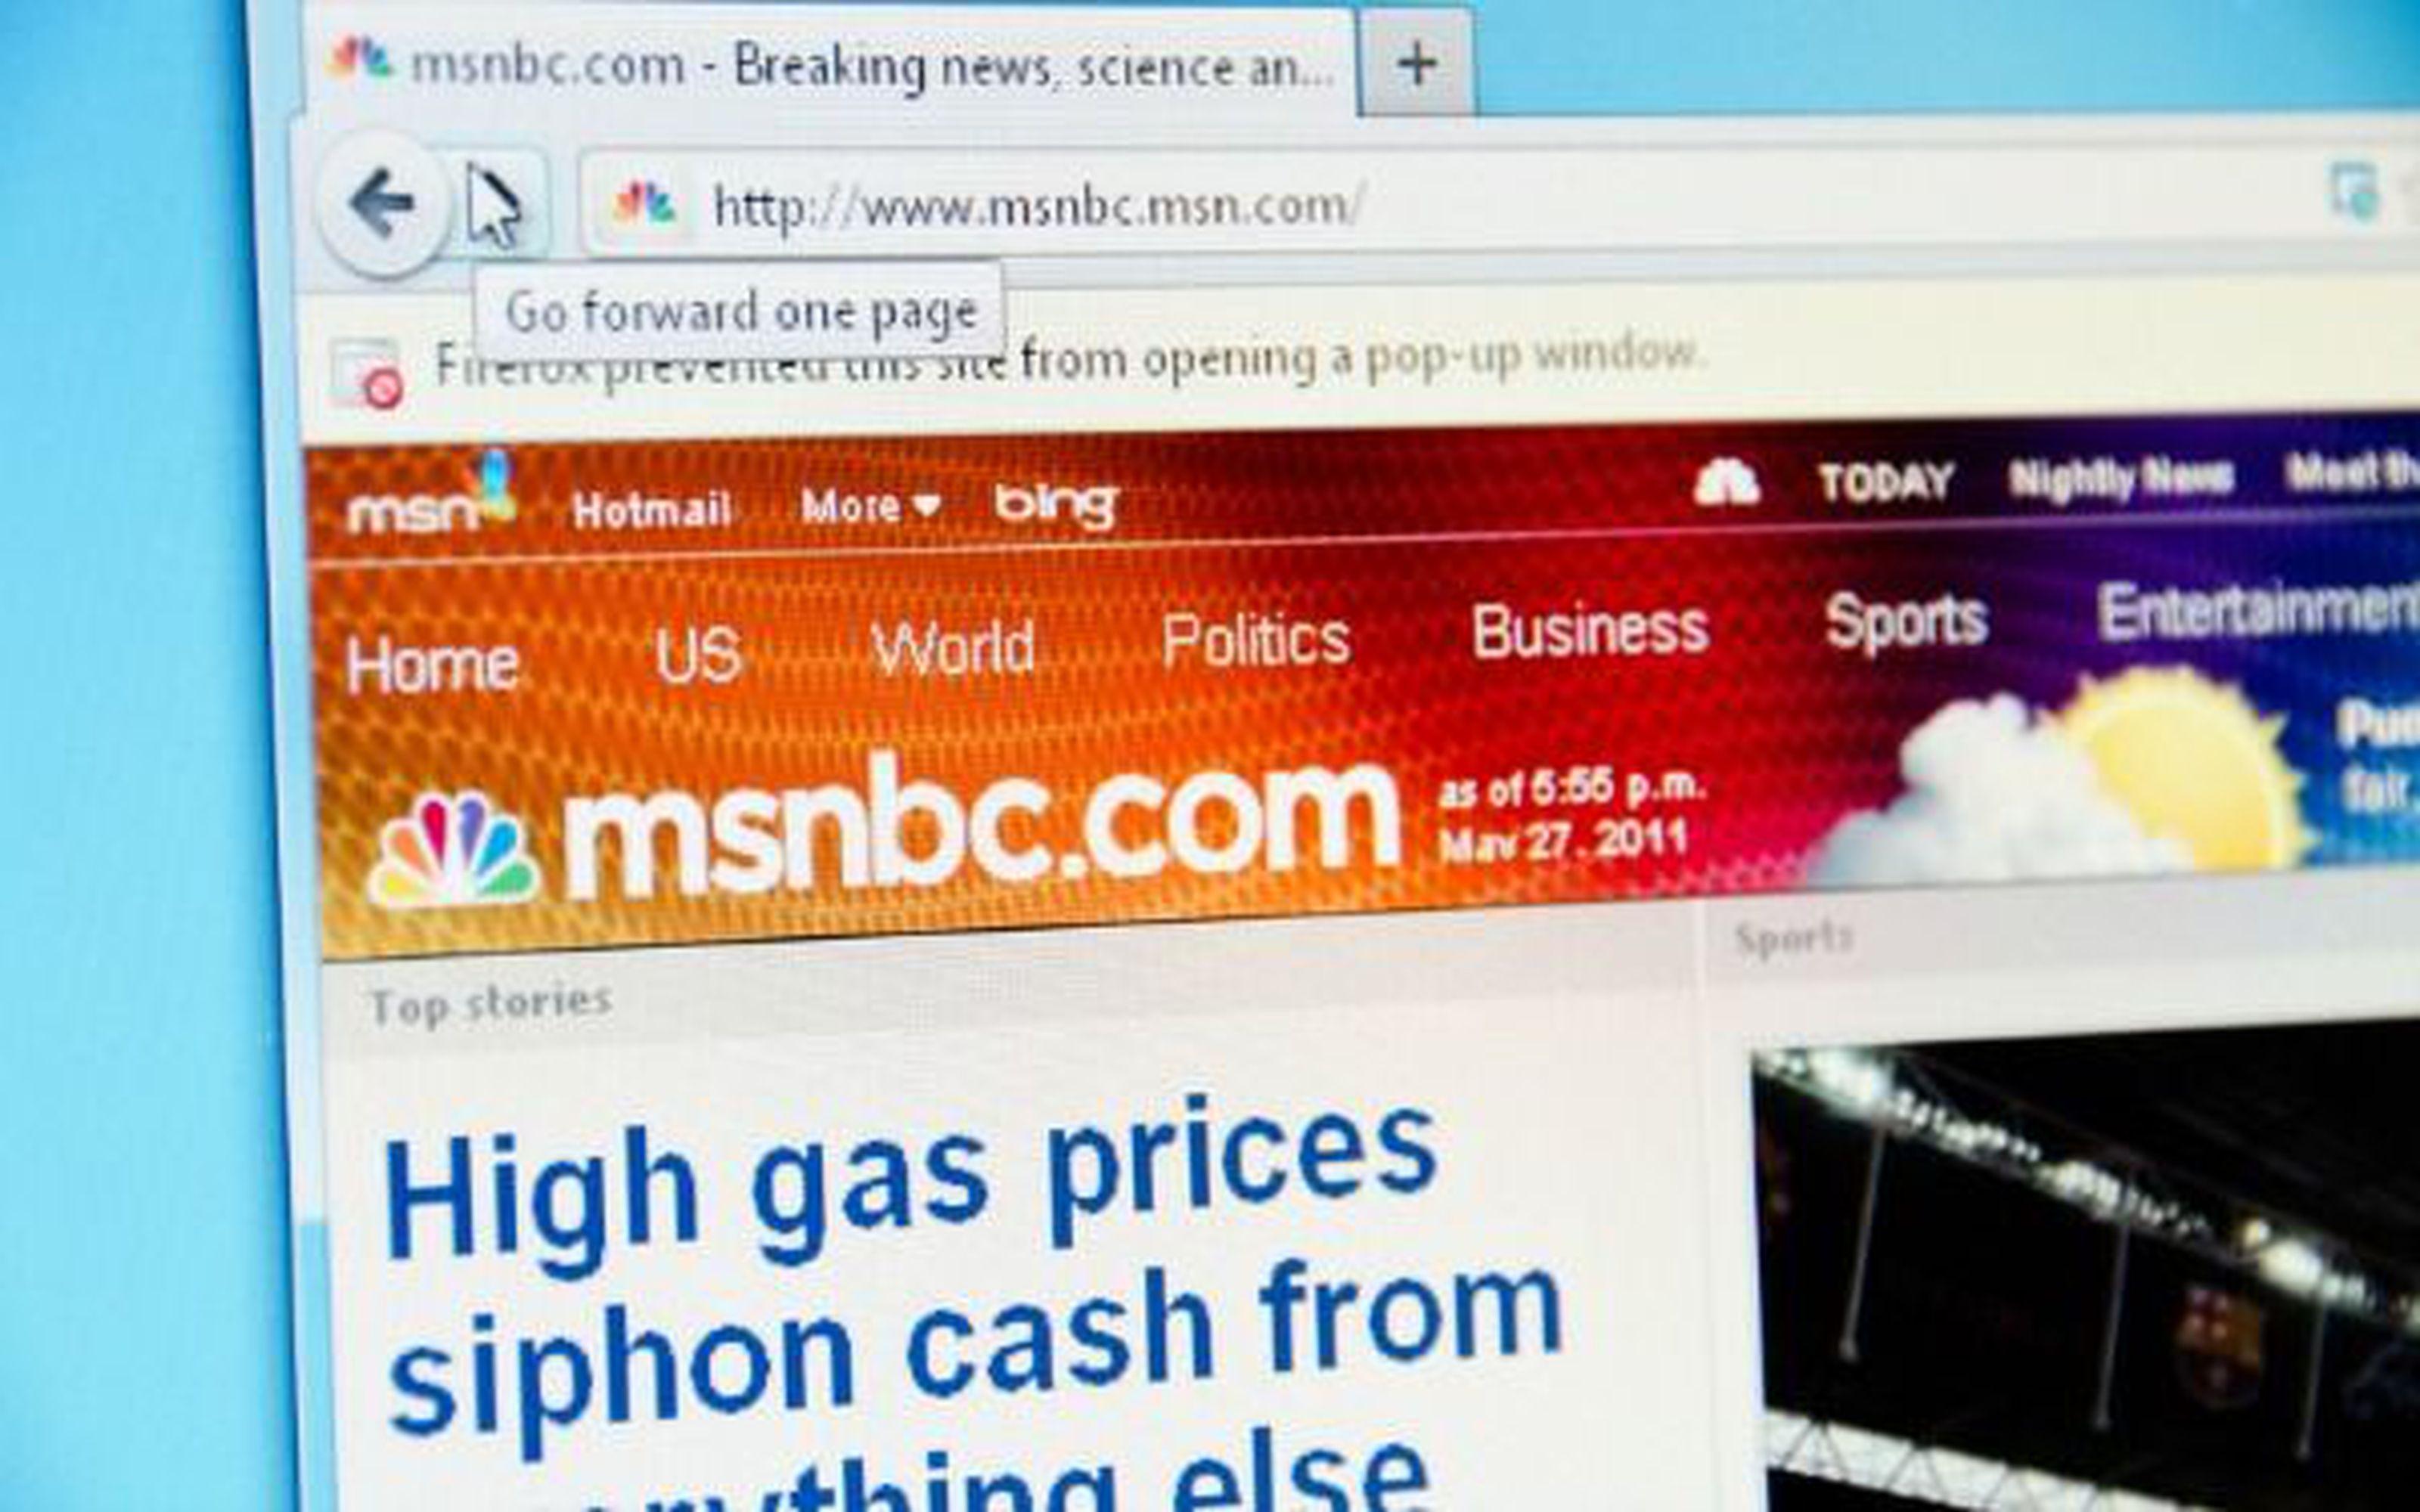 Microsoft + NBC = MSNBC